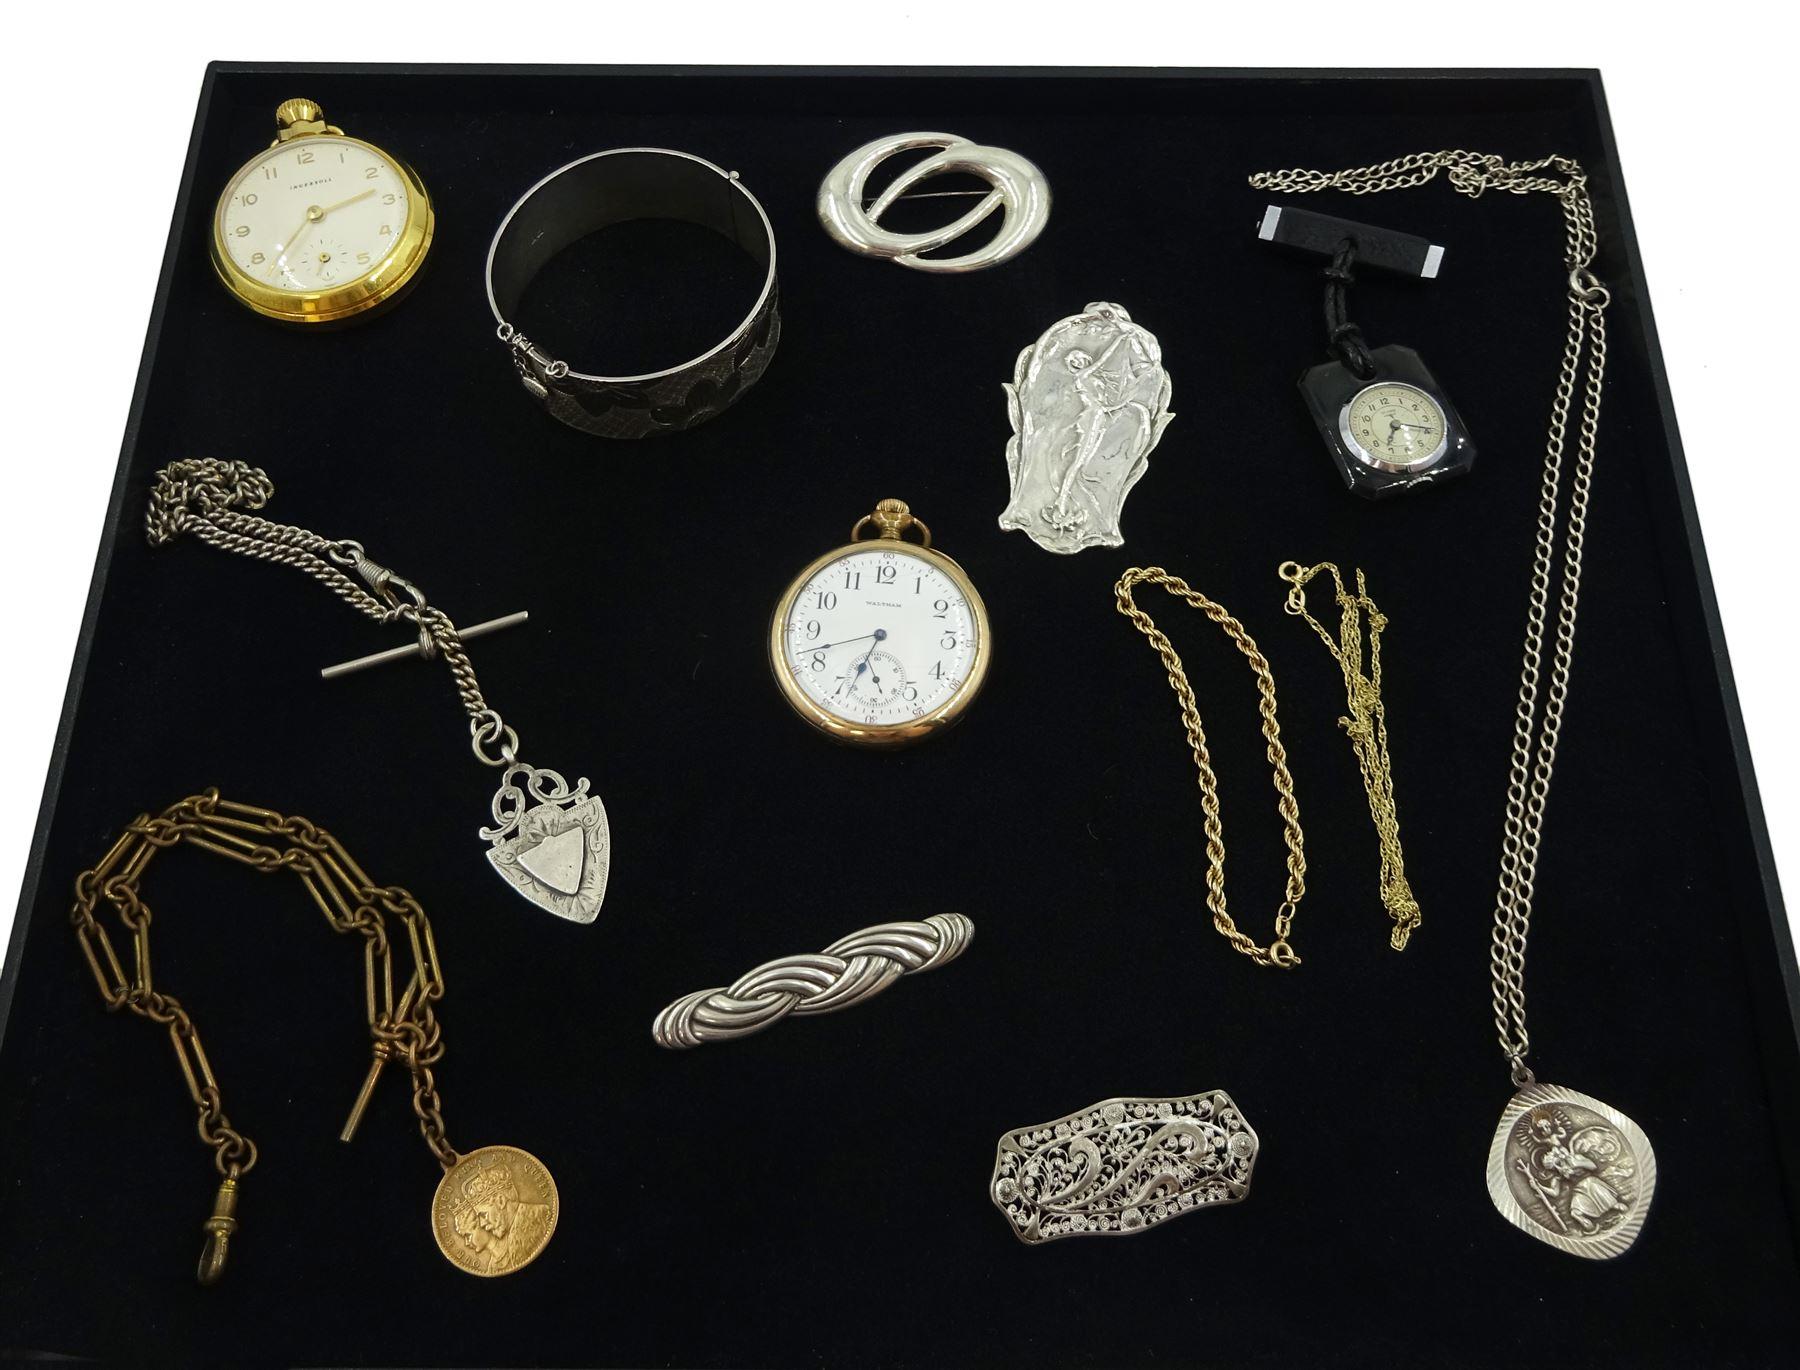 Silver jewellery including Art Nouveau style brooch